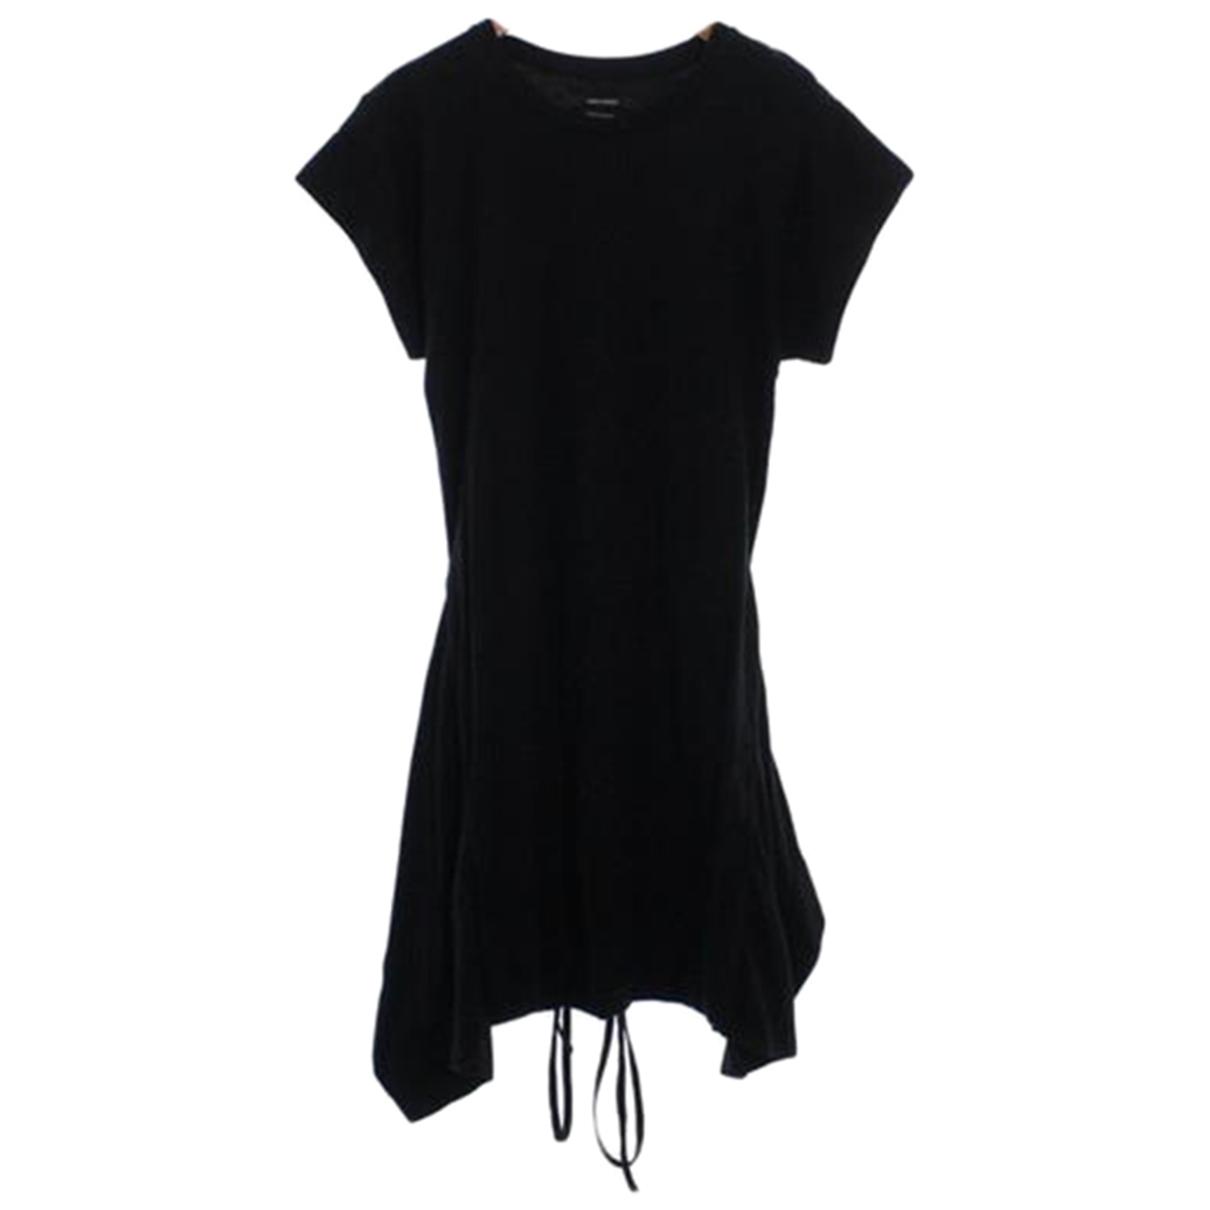 Isabel Marant \N Black Cotton dress for Women S International